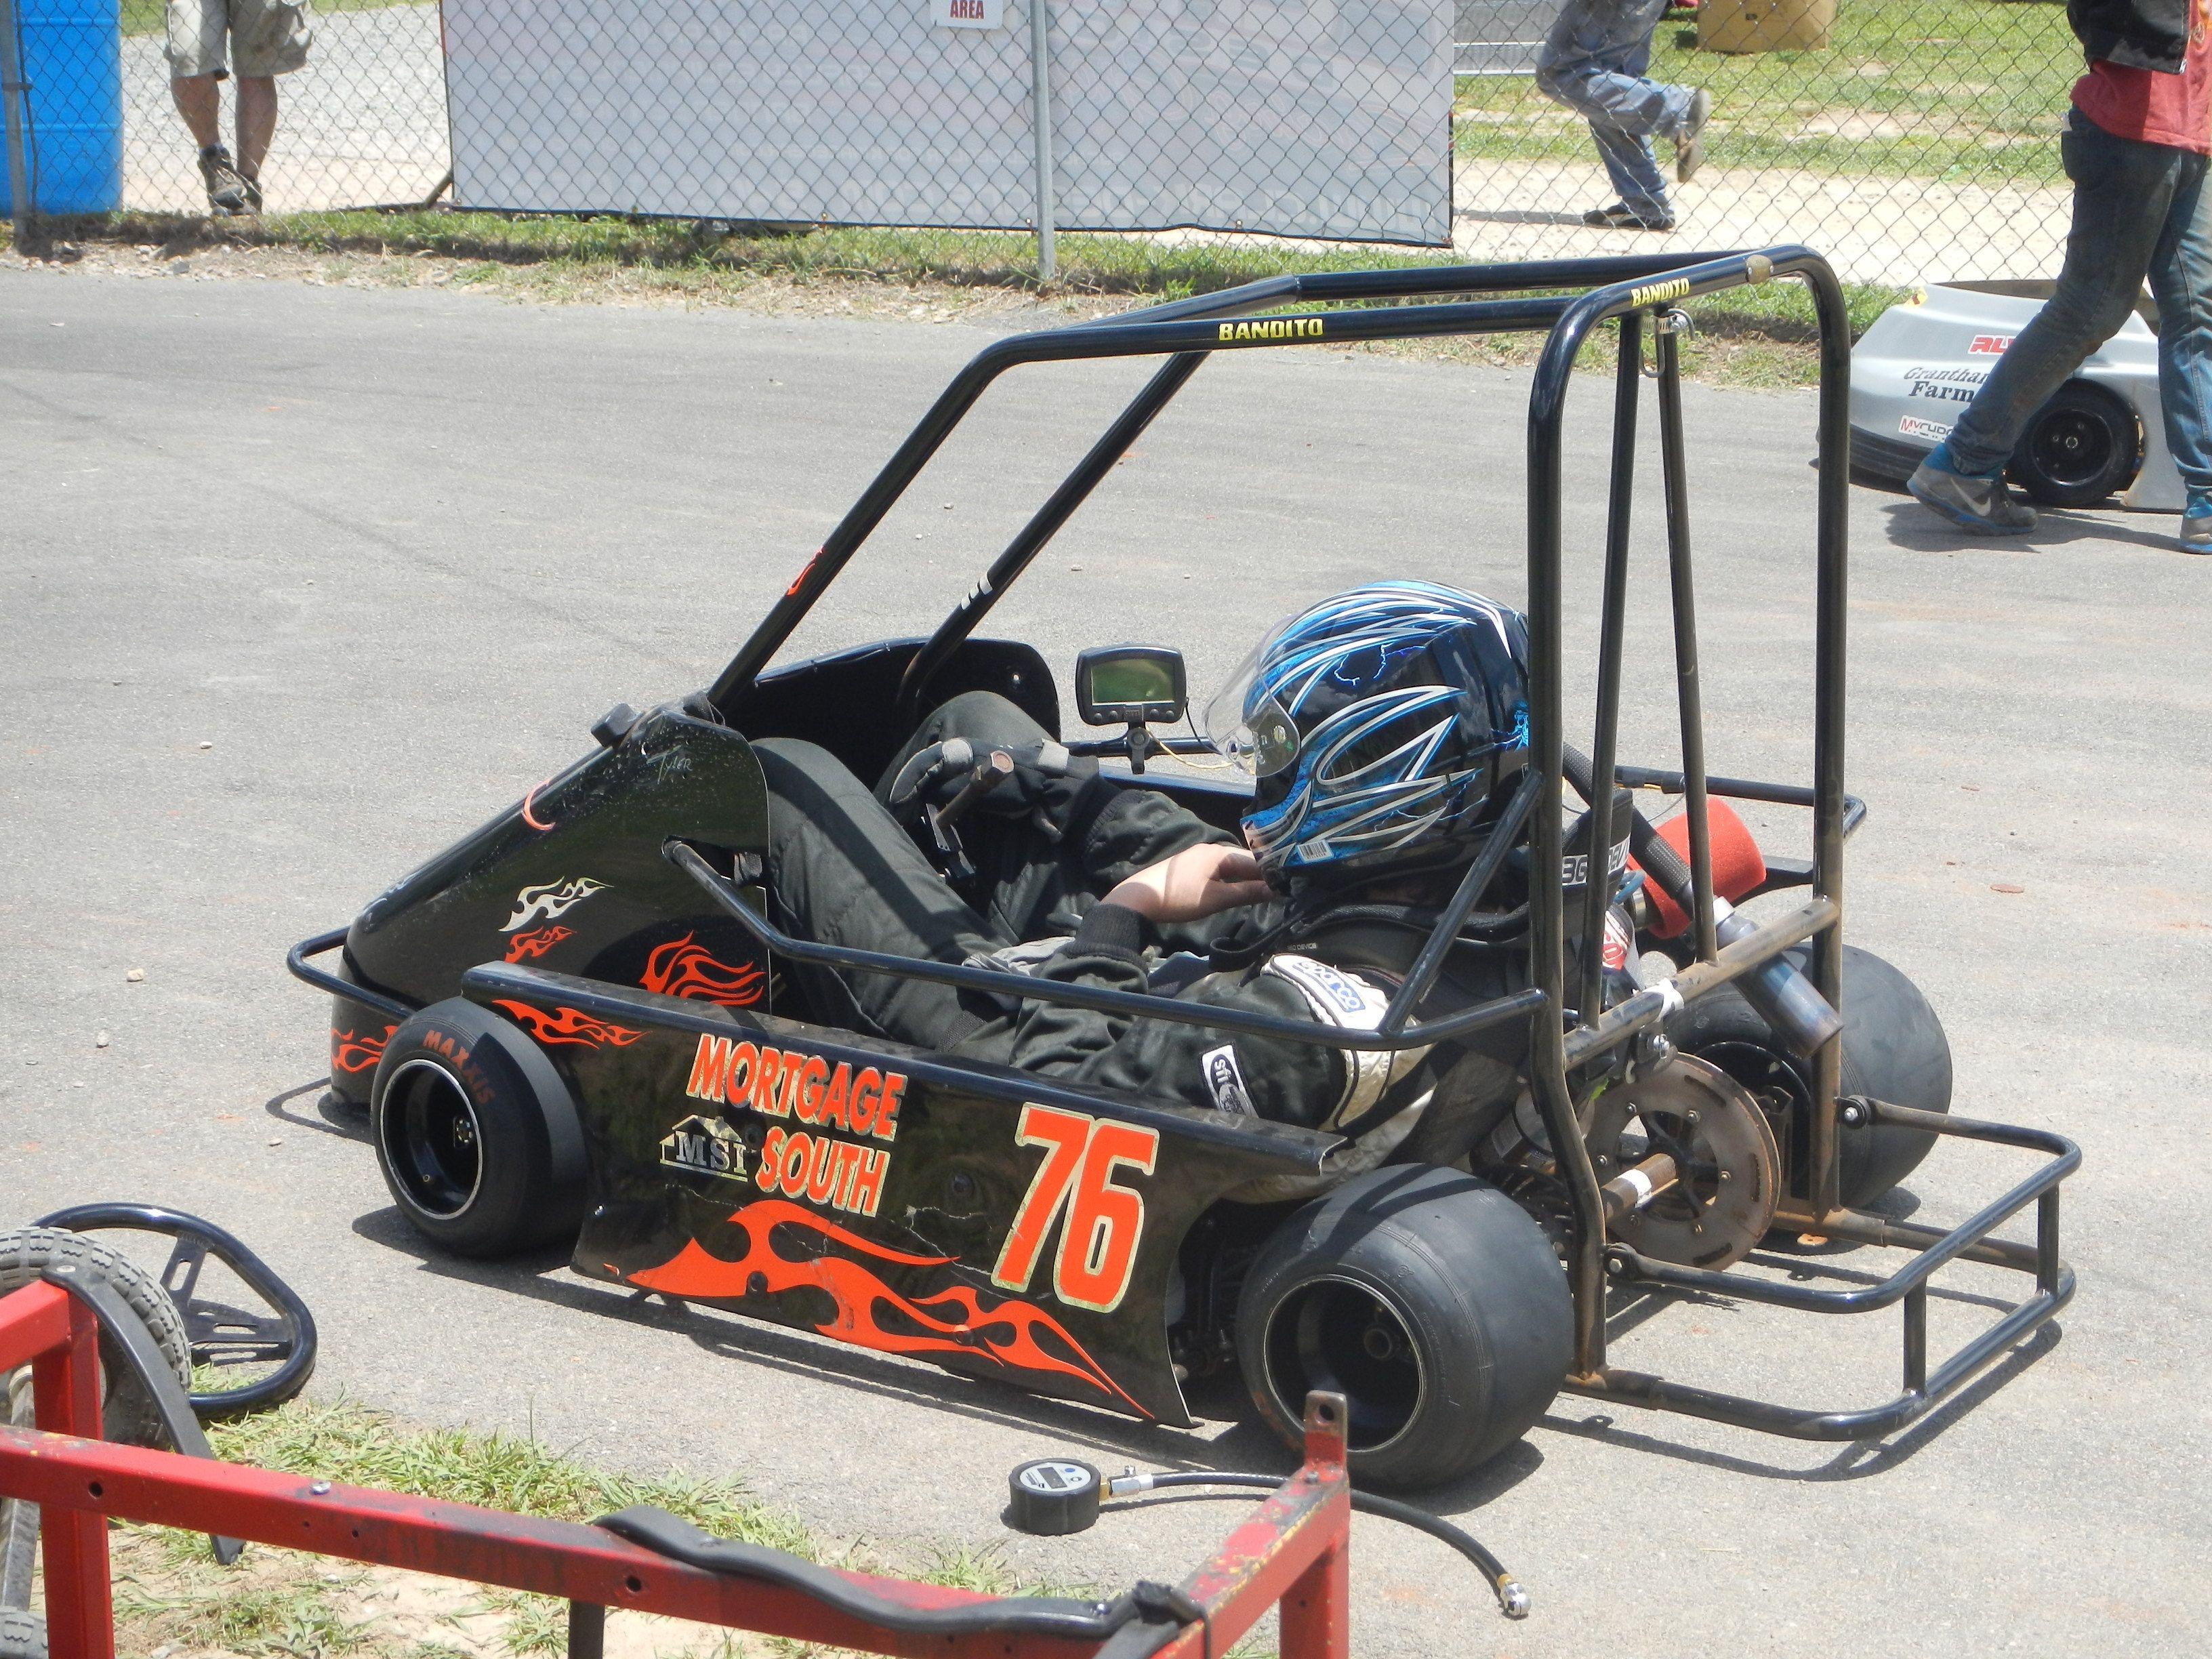 8 dirt track racing kart | Oval Dirt Track Racers | Pinterest ...